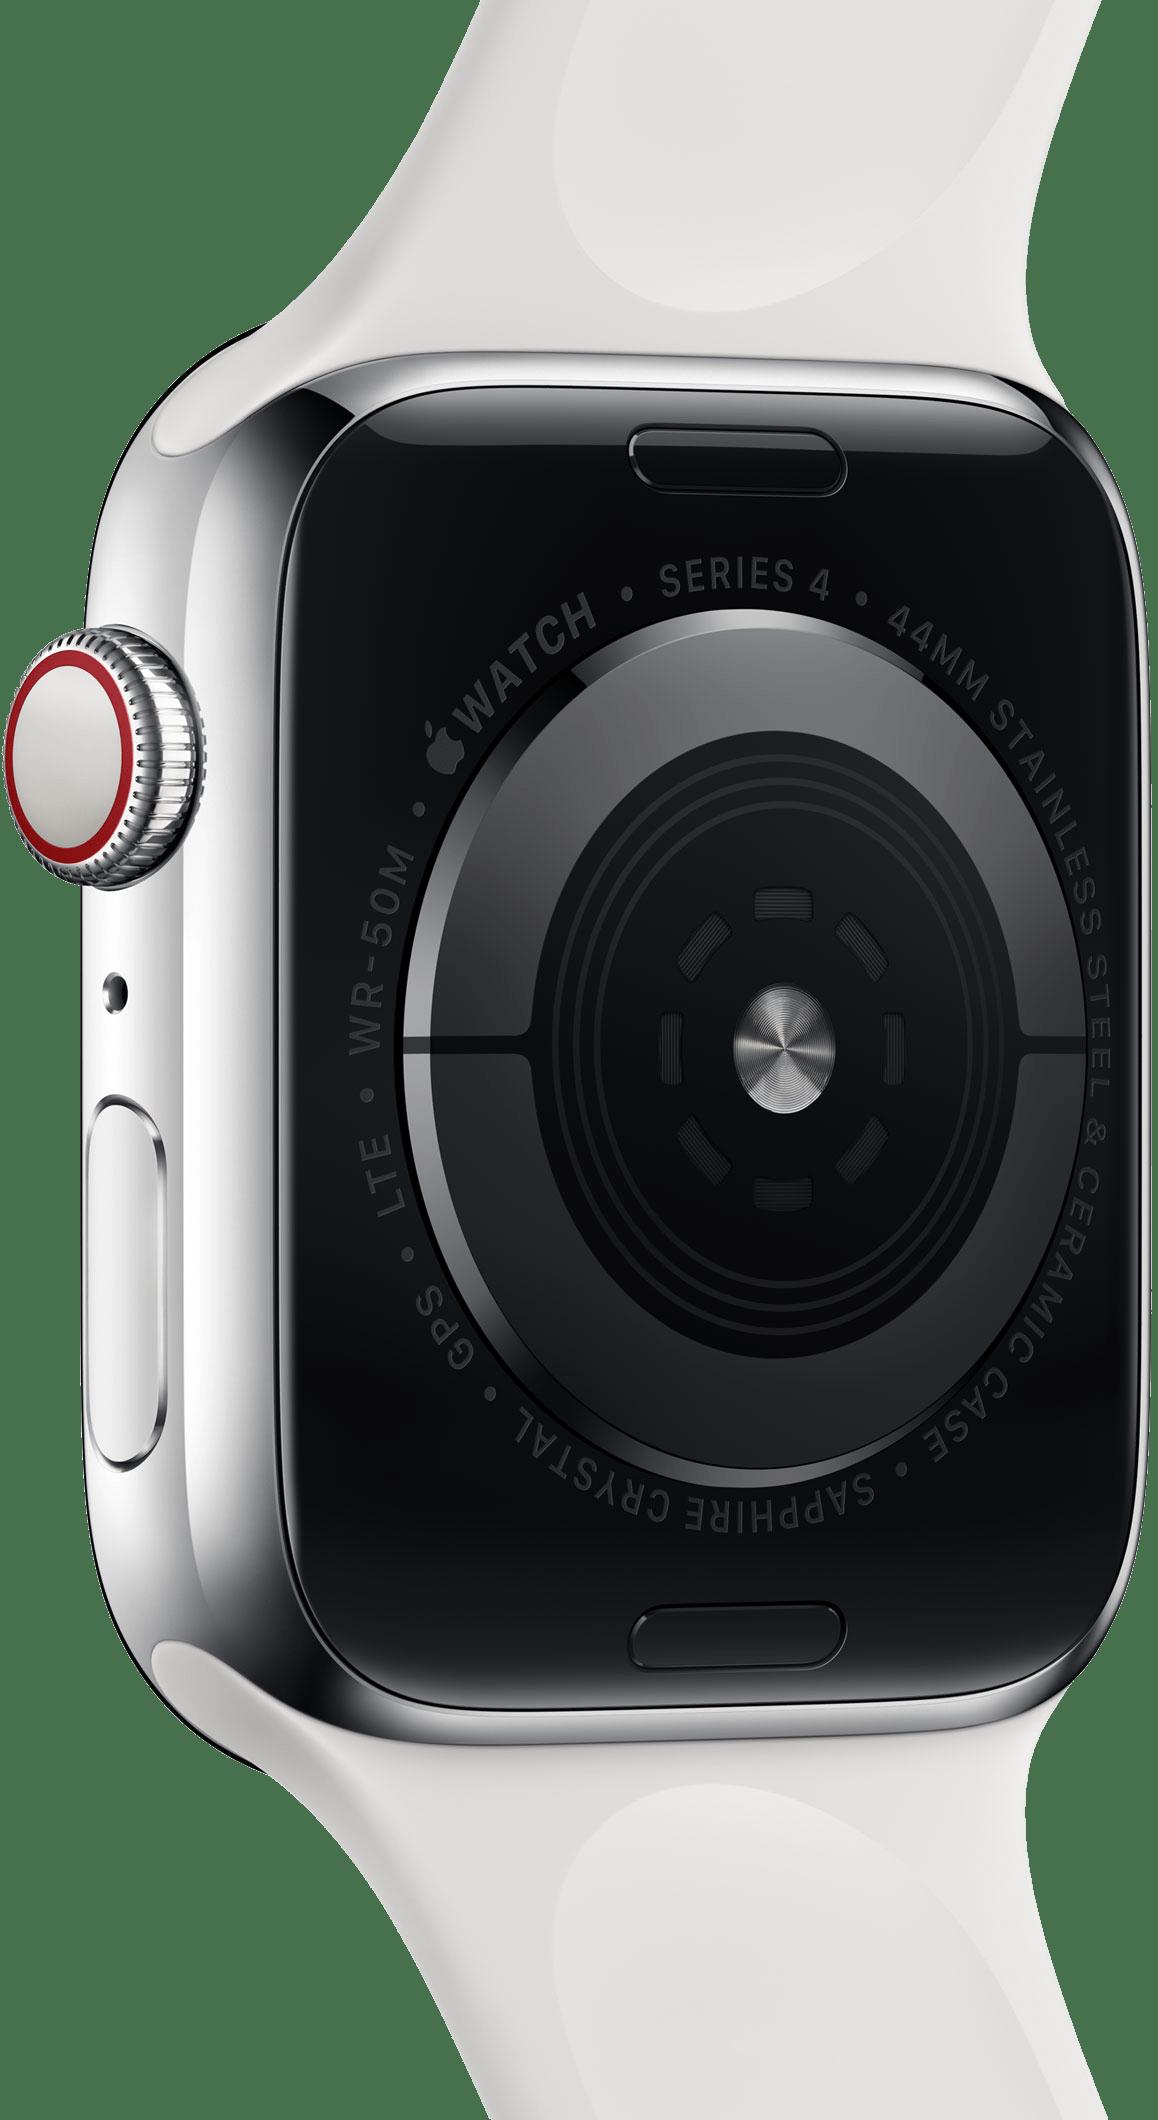 Sensores do Apple Watch Series 4